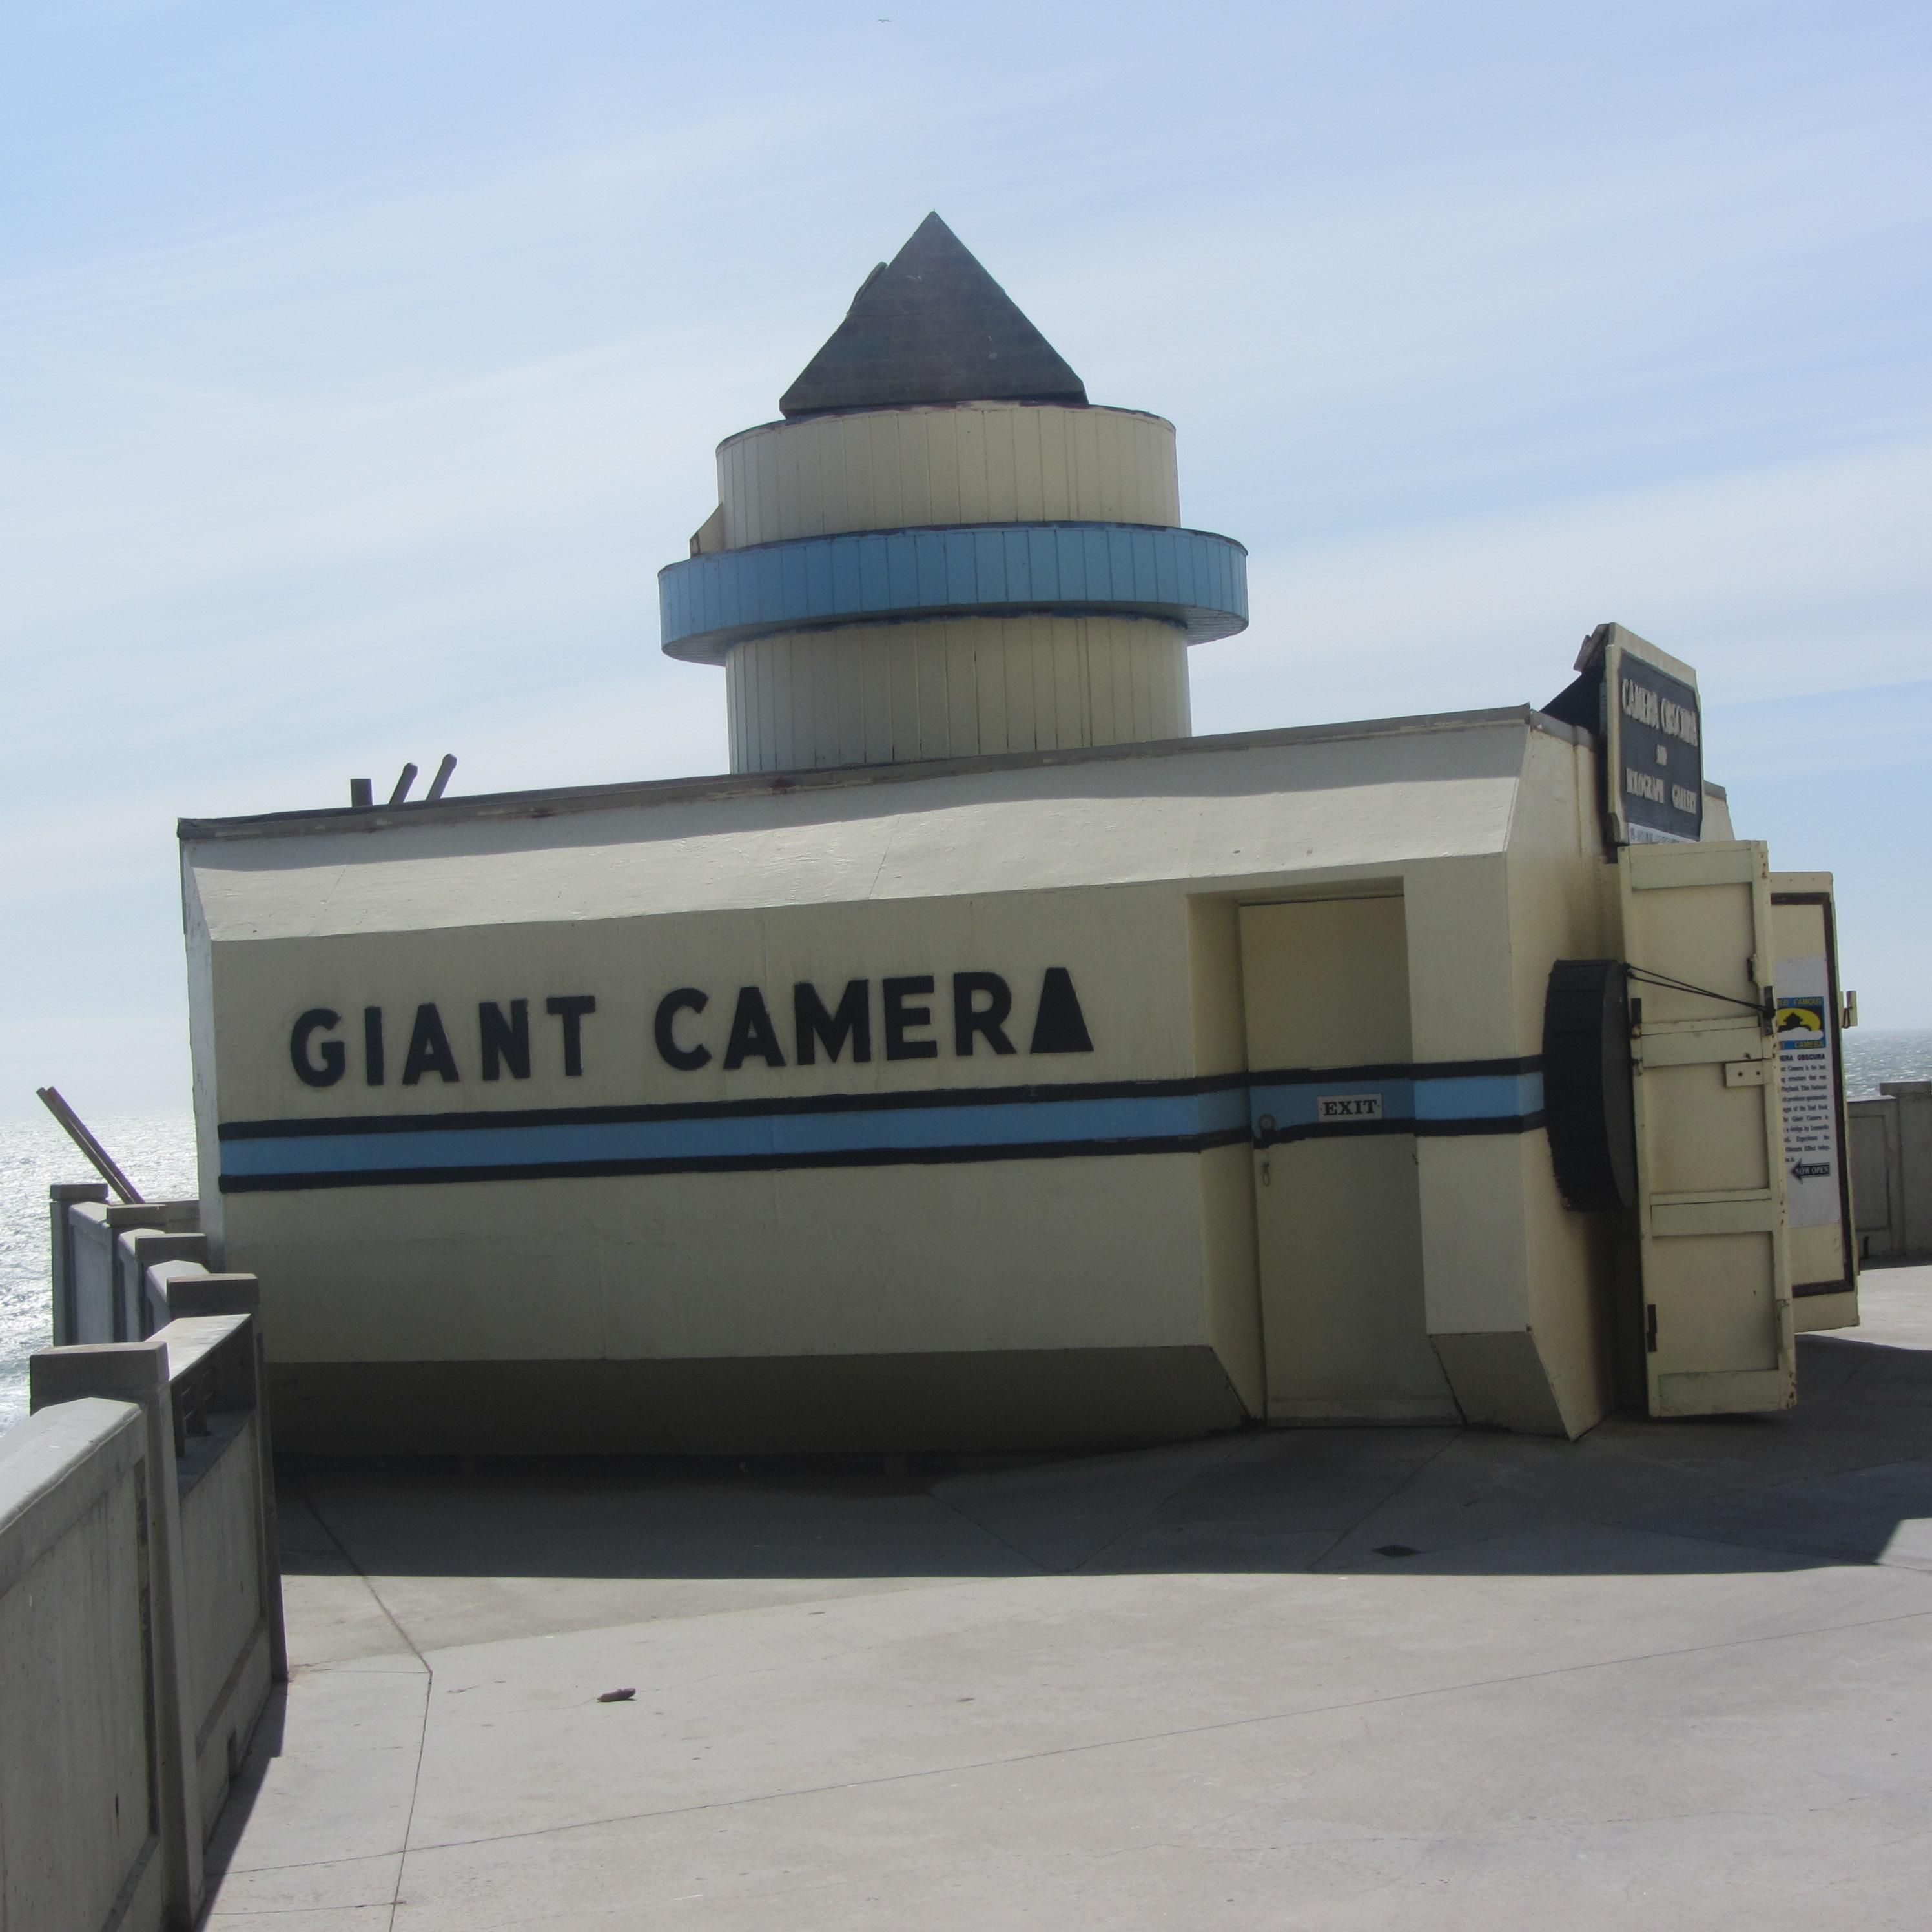 Cliff House, San Francisco | Exploring my own backyard